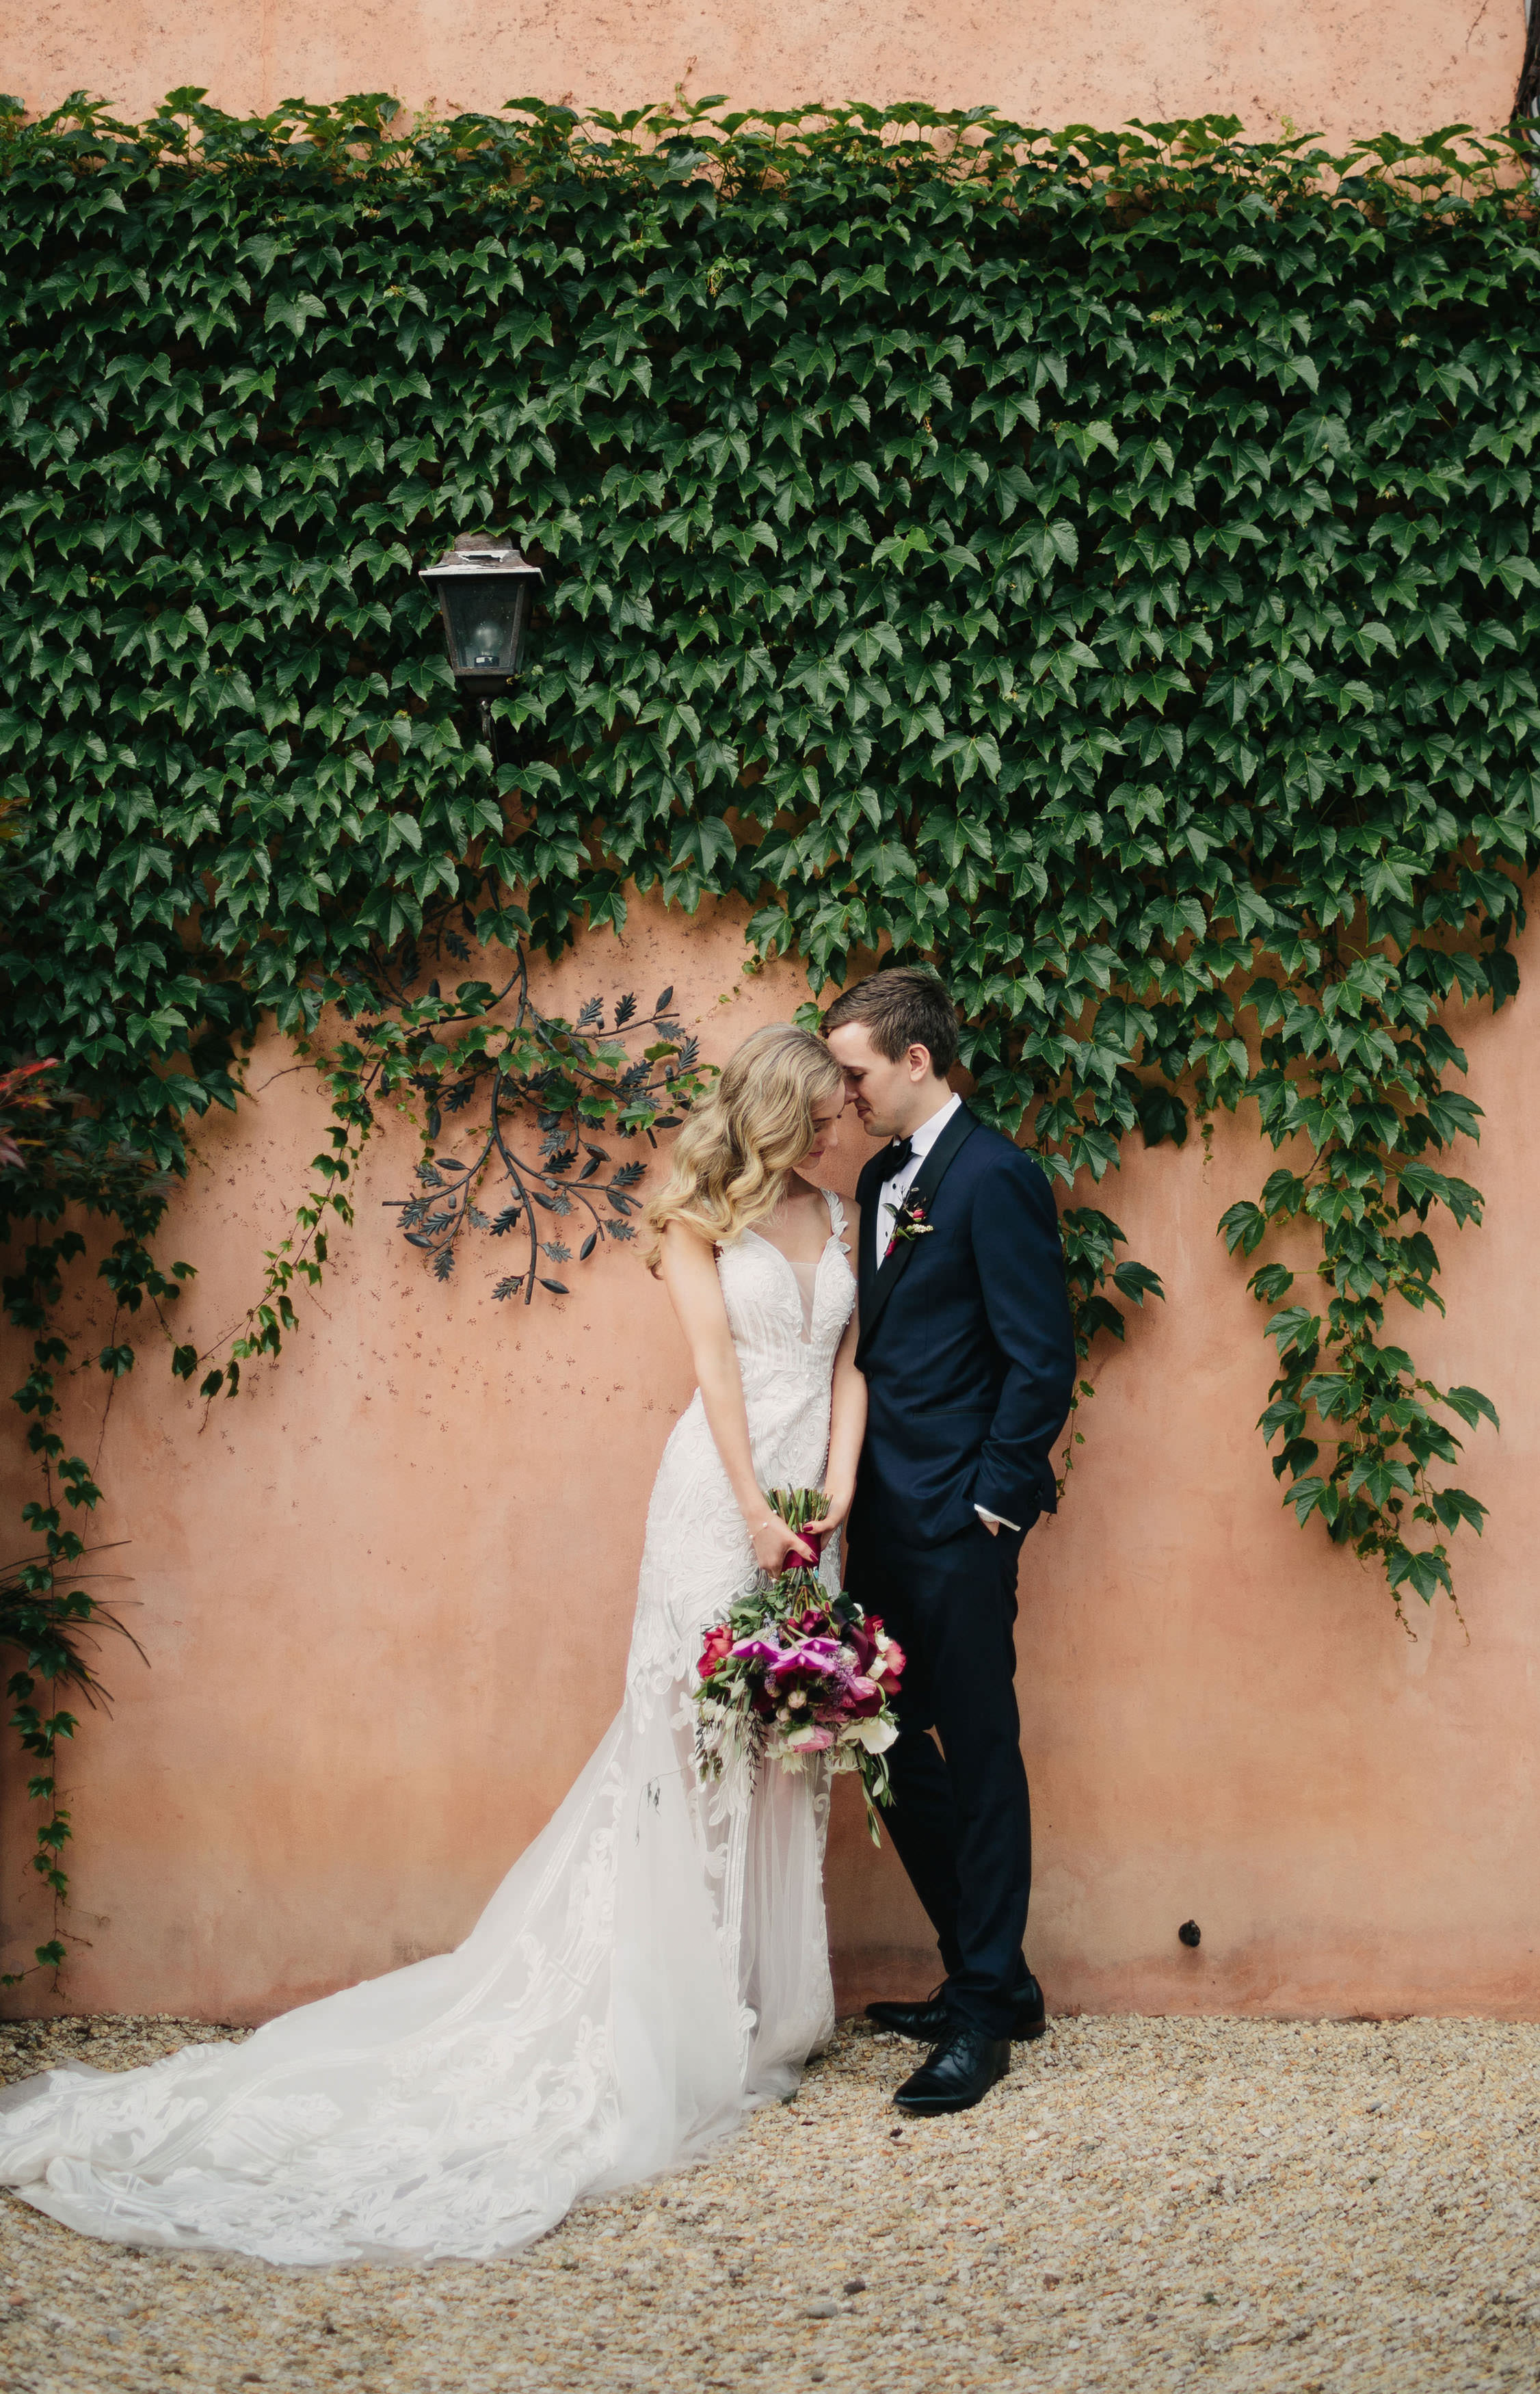 068_hunter_valley_wedding_photography_redleaf_paul_bamford_finchandoak.jpg